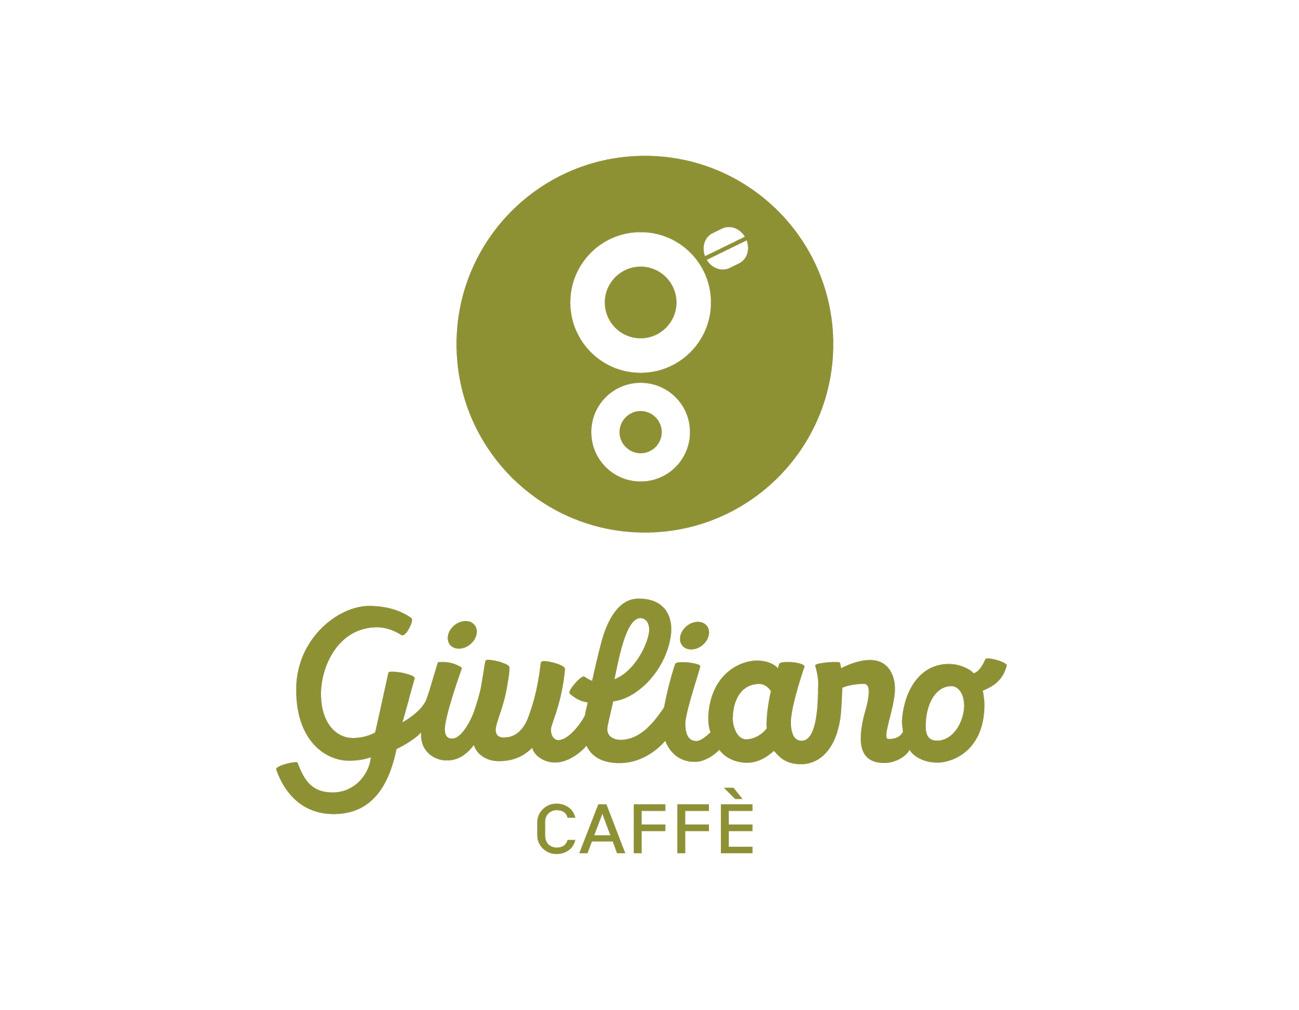 Giuliano-caffè